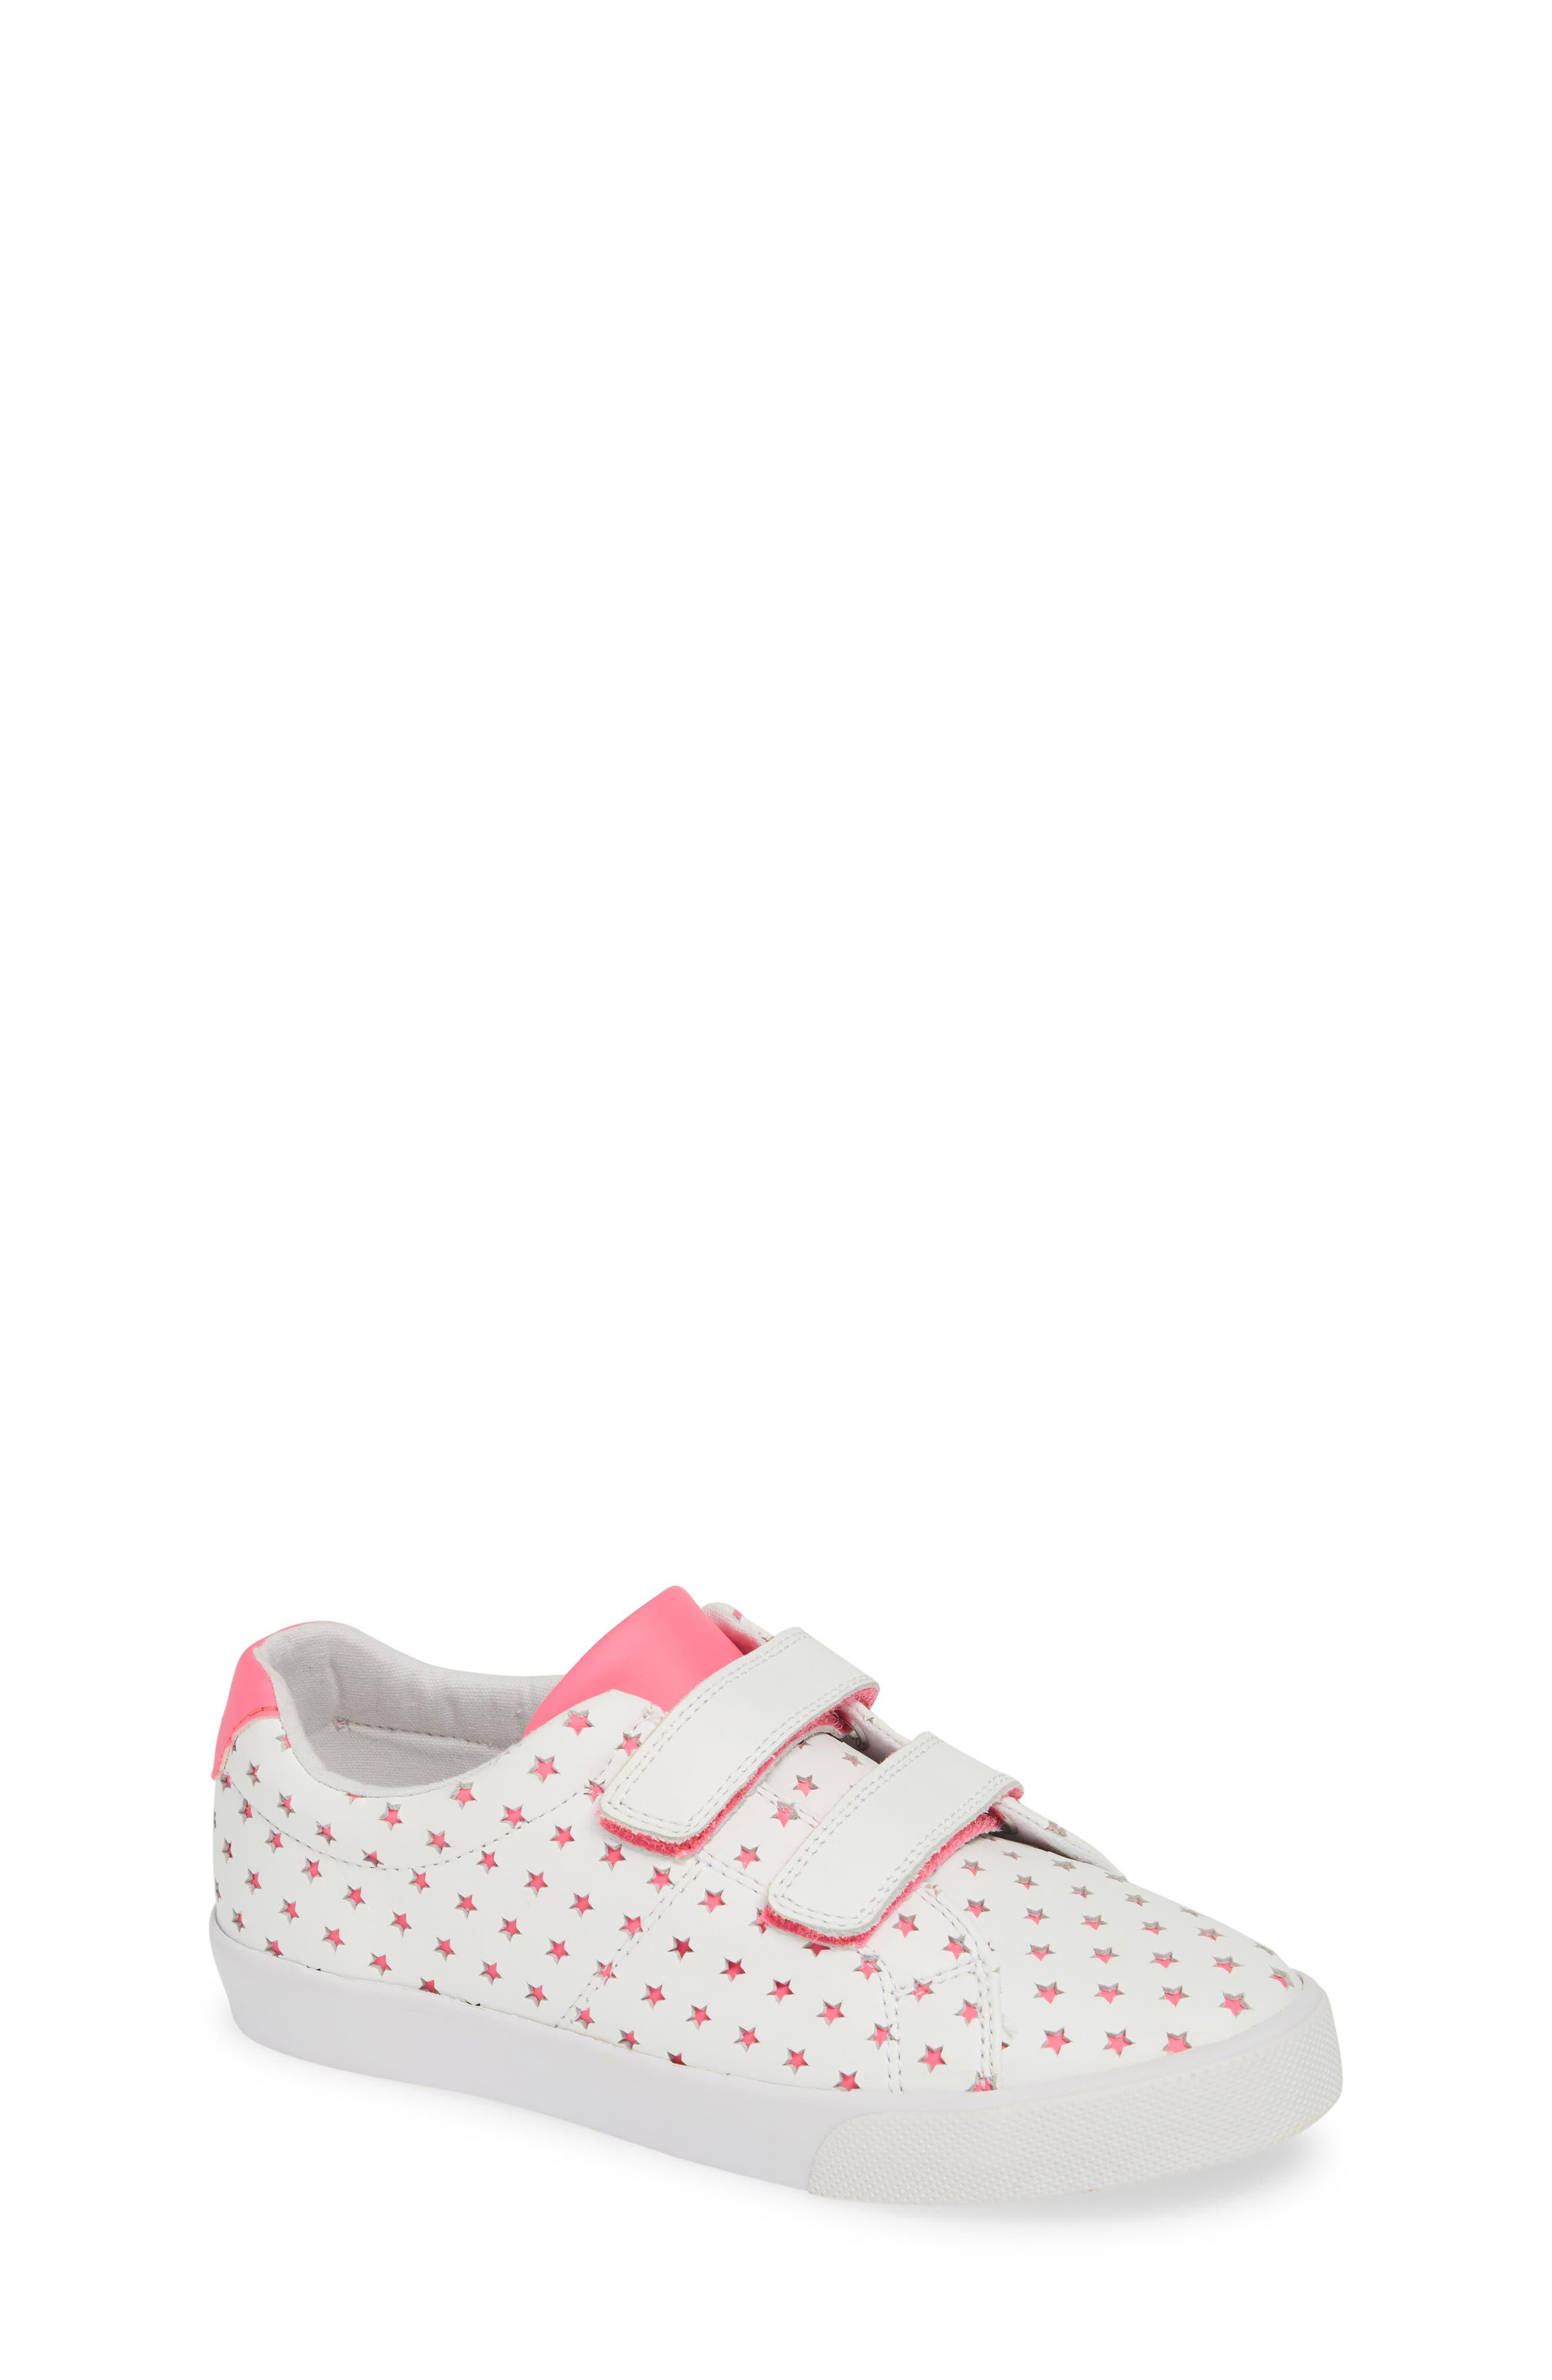 573c6cb7089409 Toddler Girls  Mini Boden Shoes (Sizes 7.5-12)